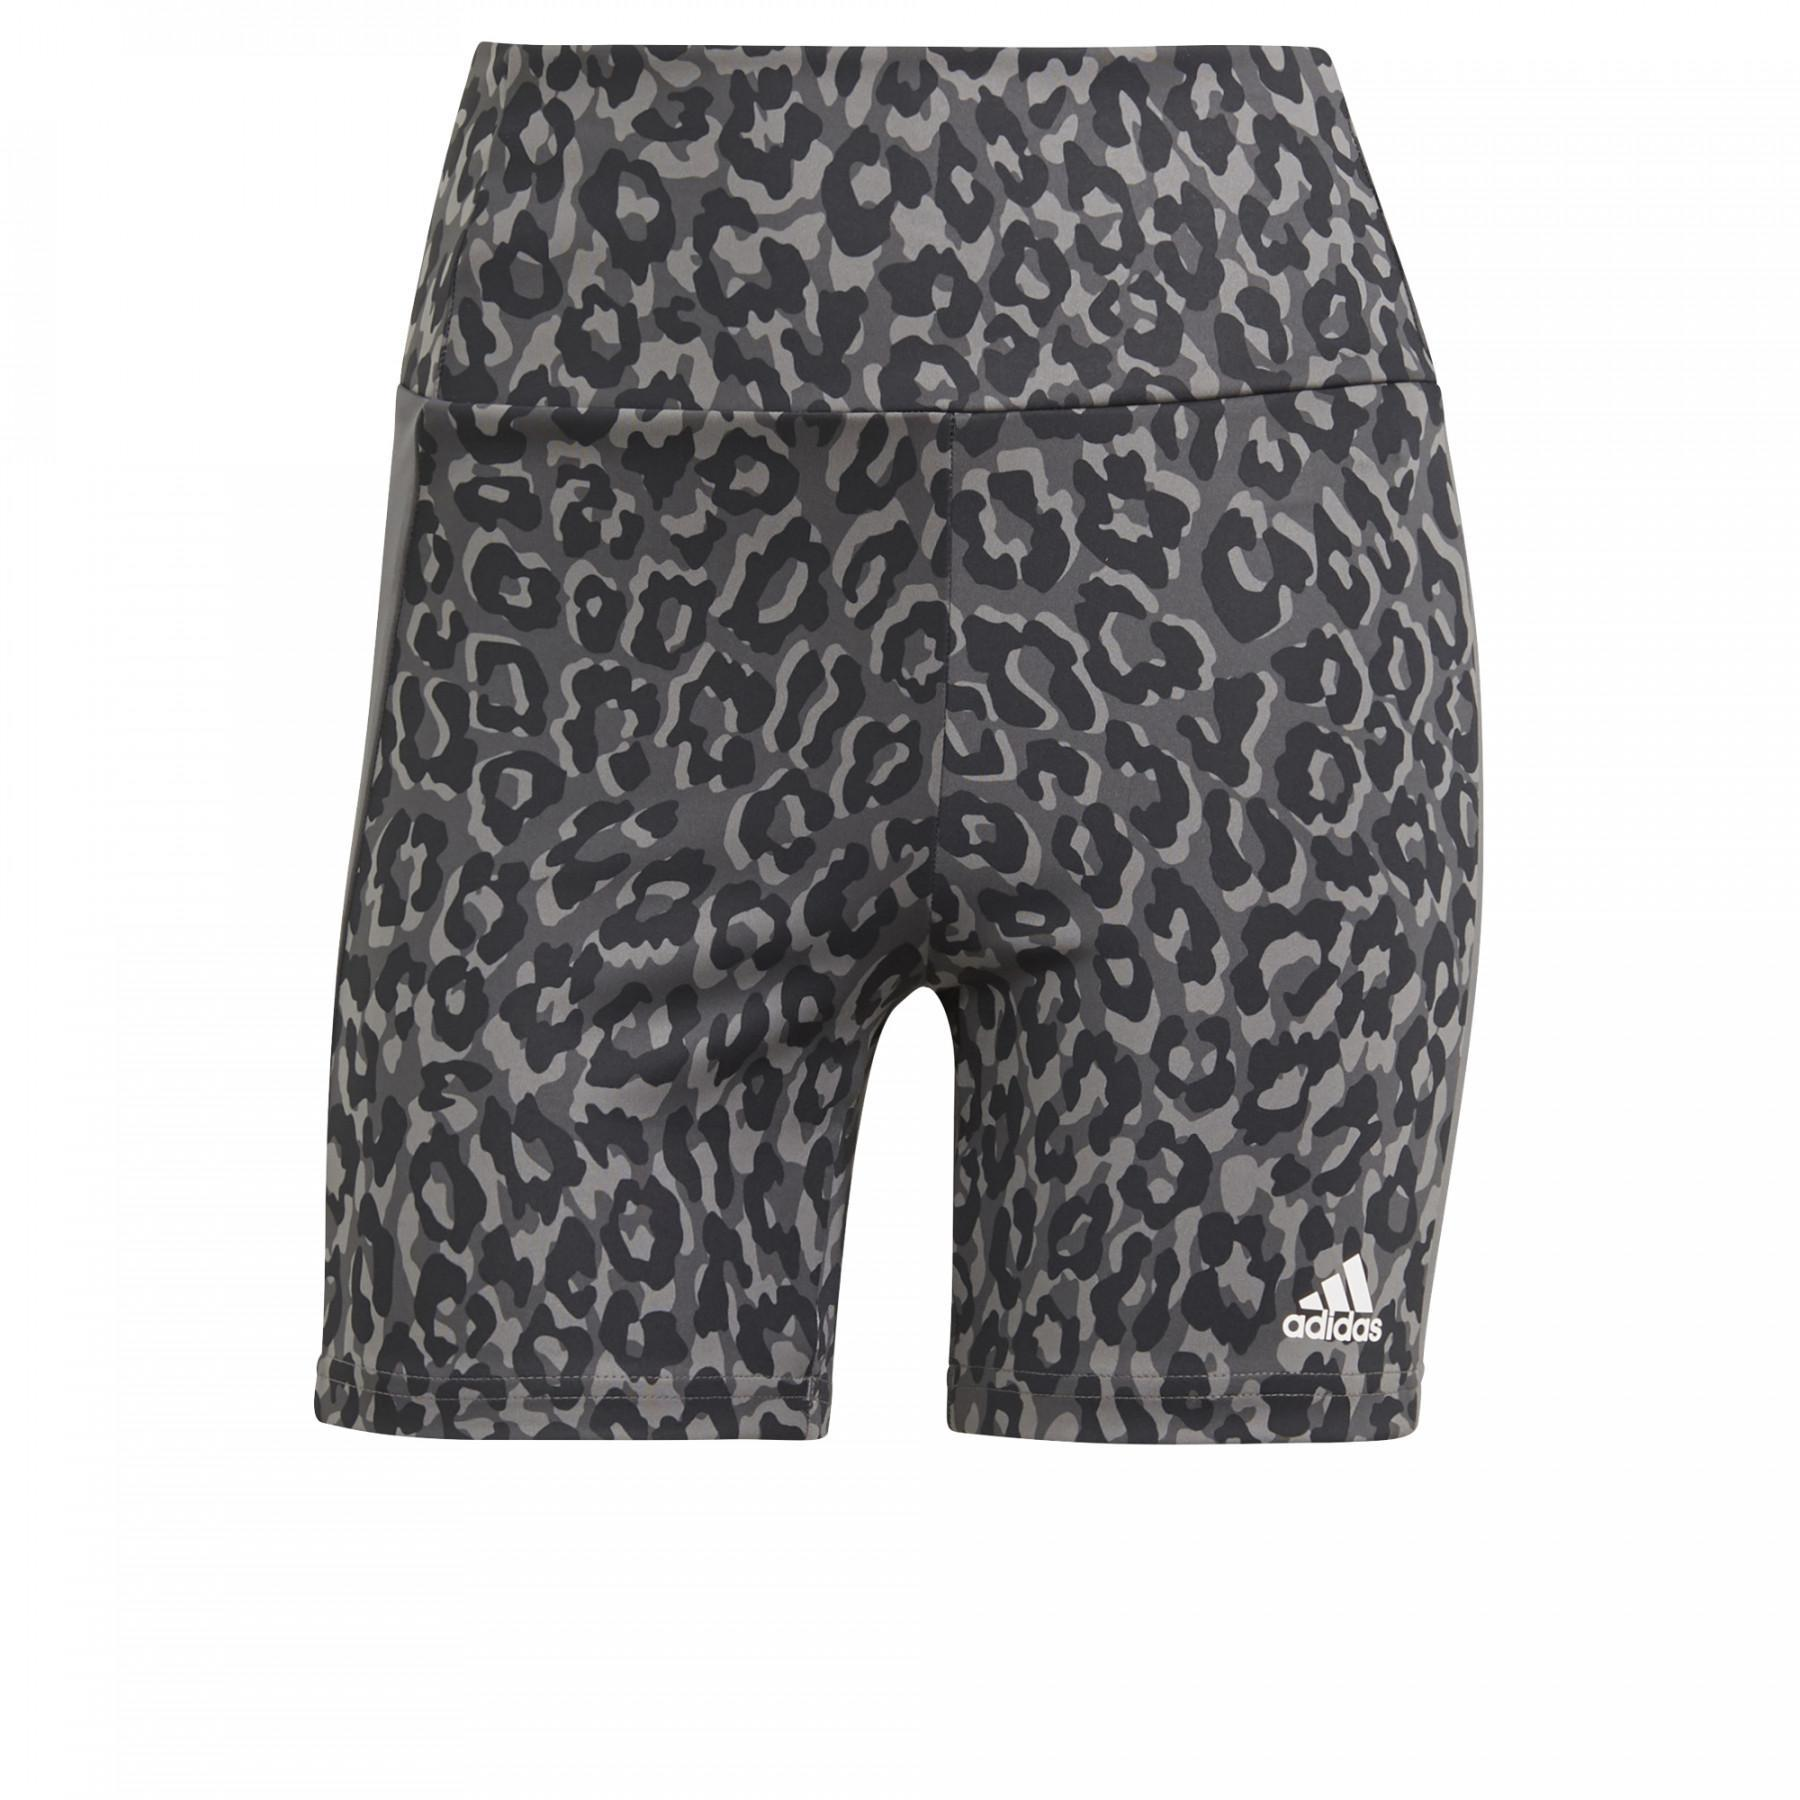 adidas Women's Cyclist Designed To Move Aeoready Leopard Print